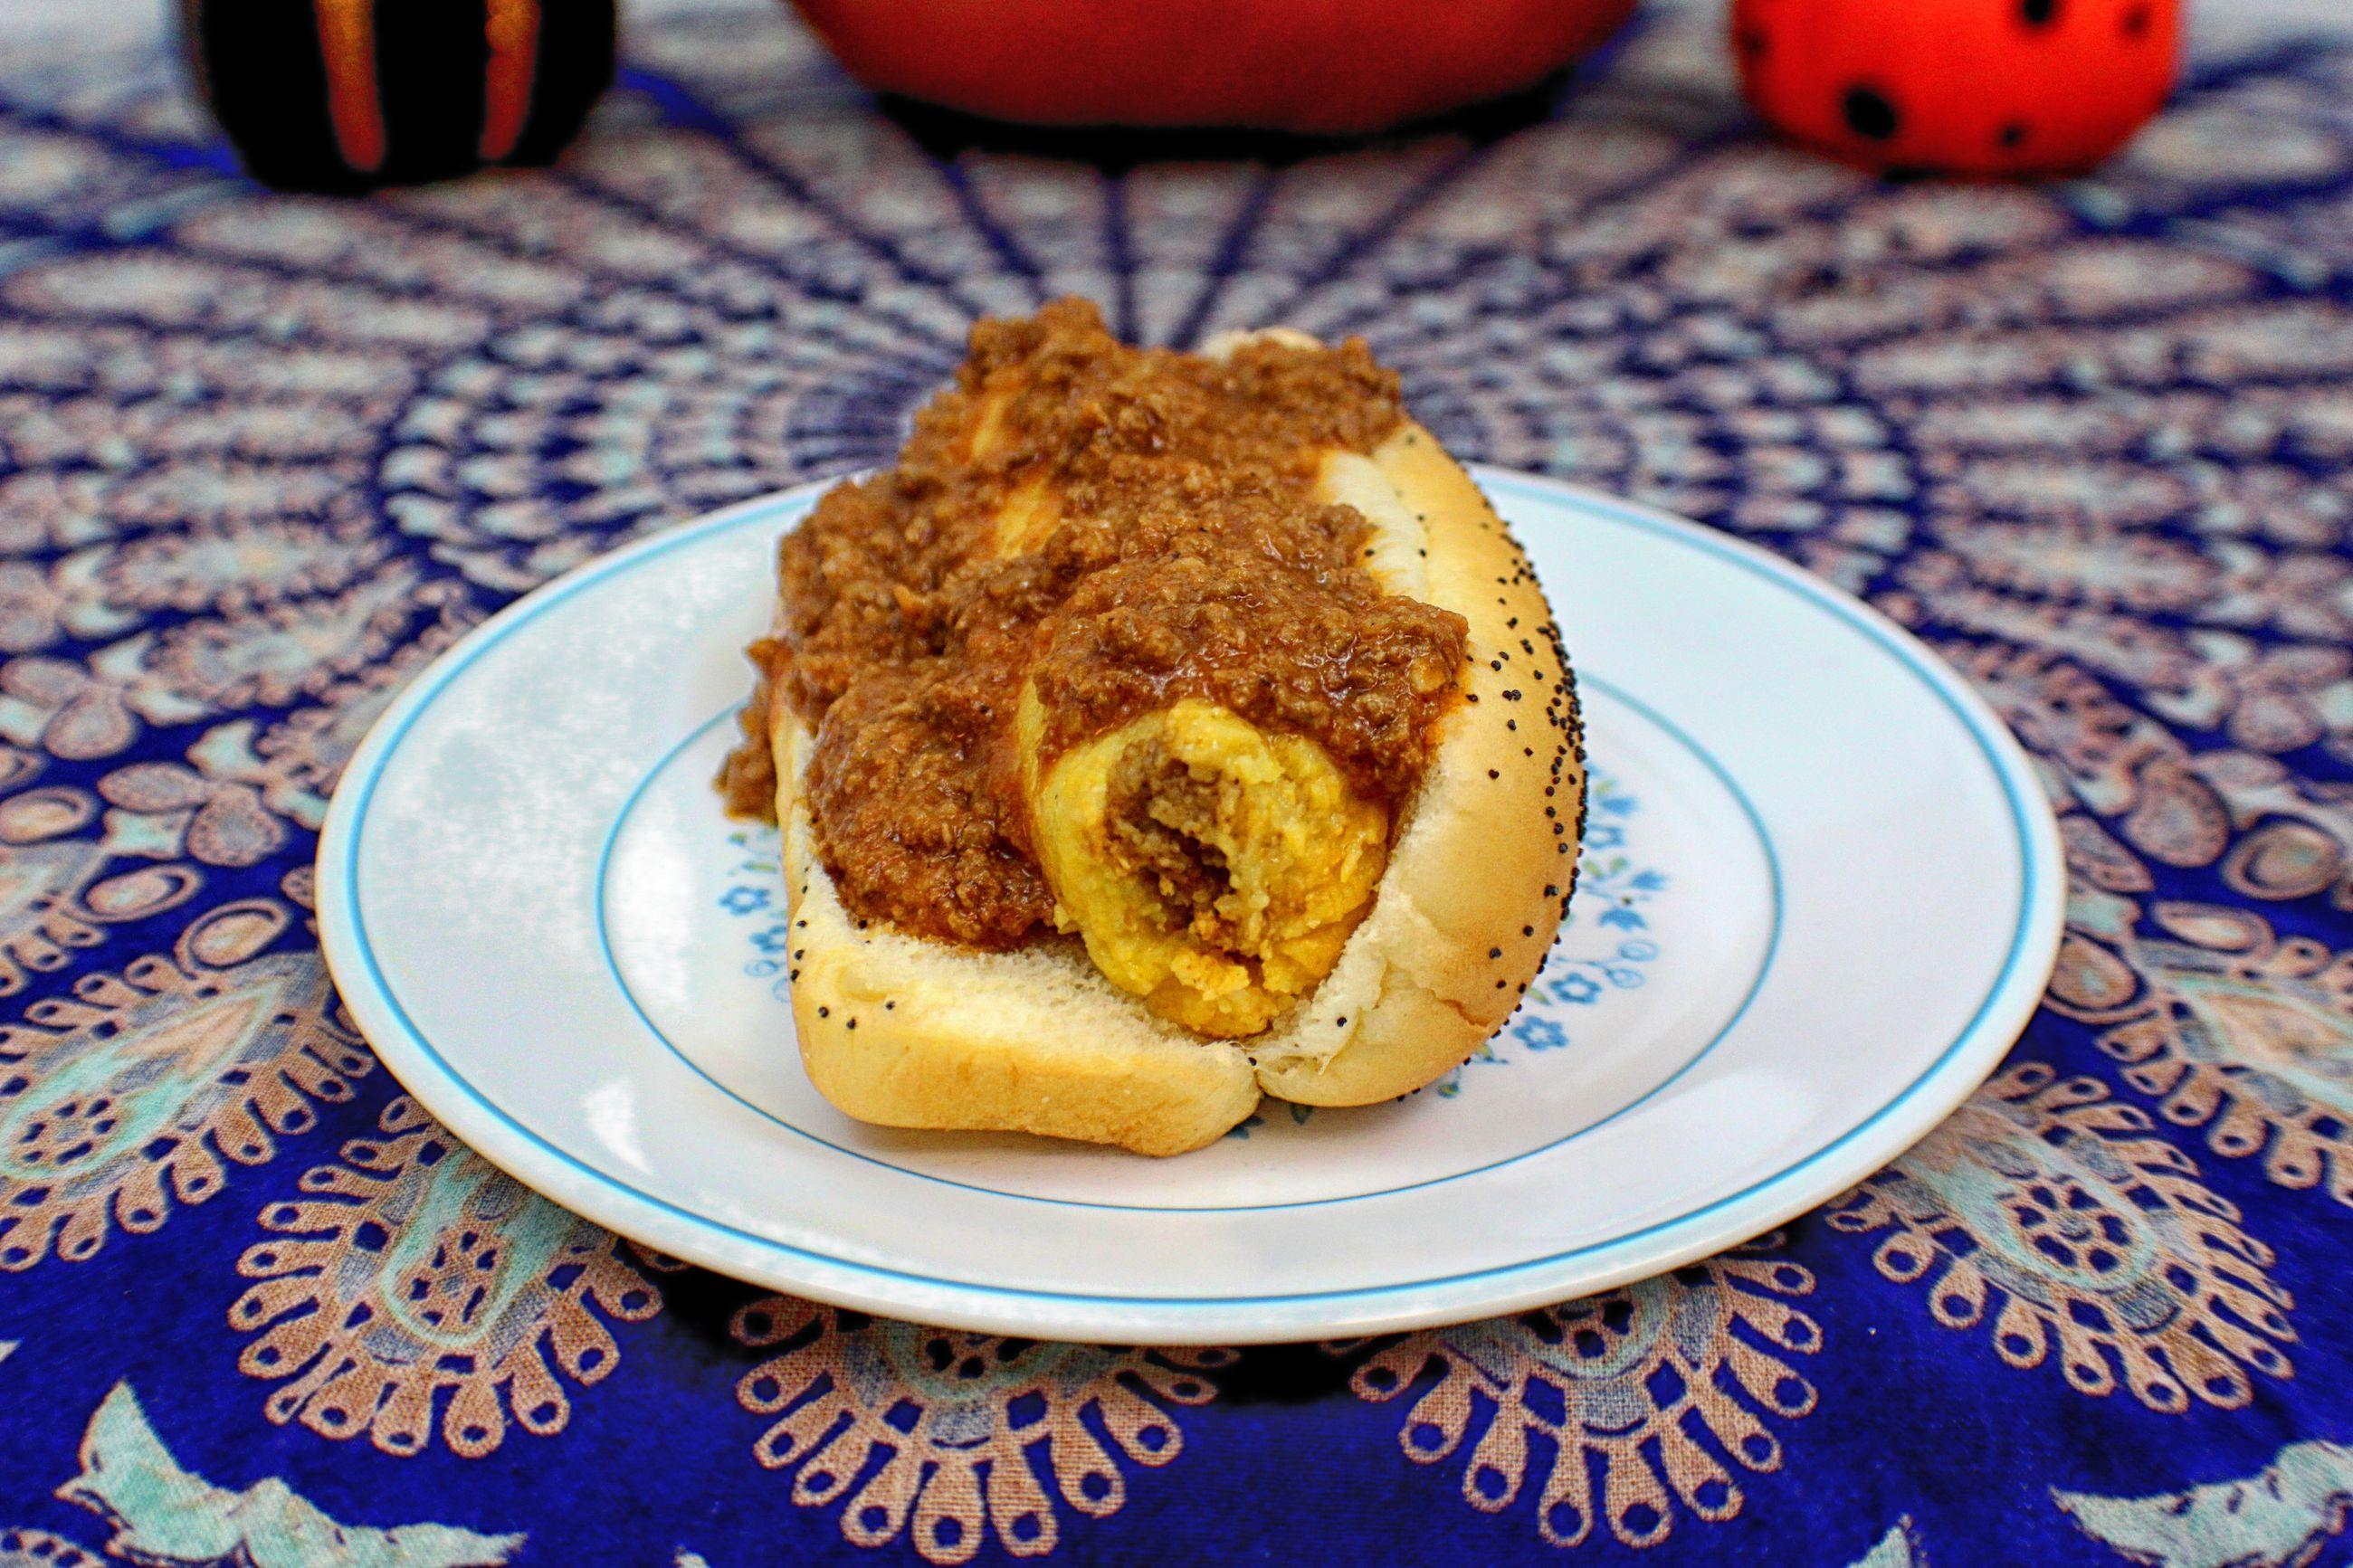 Advantage And Disadvantage Of A Hot Dog